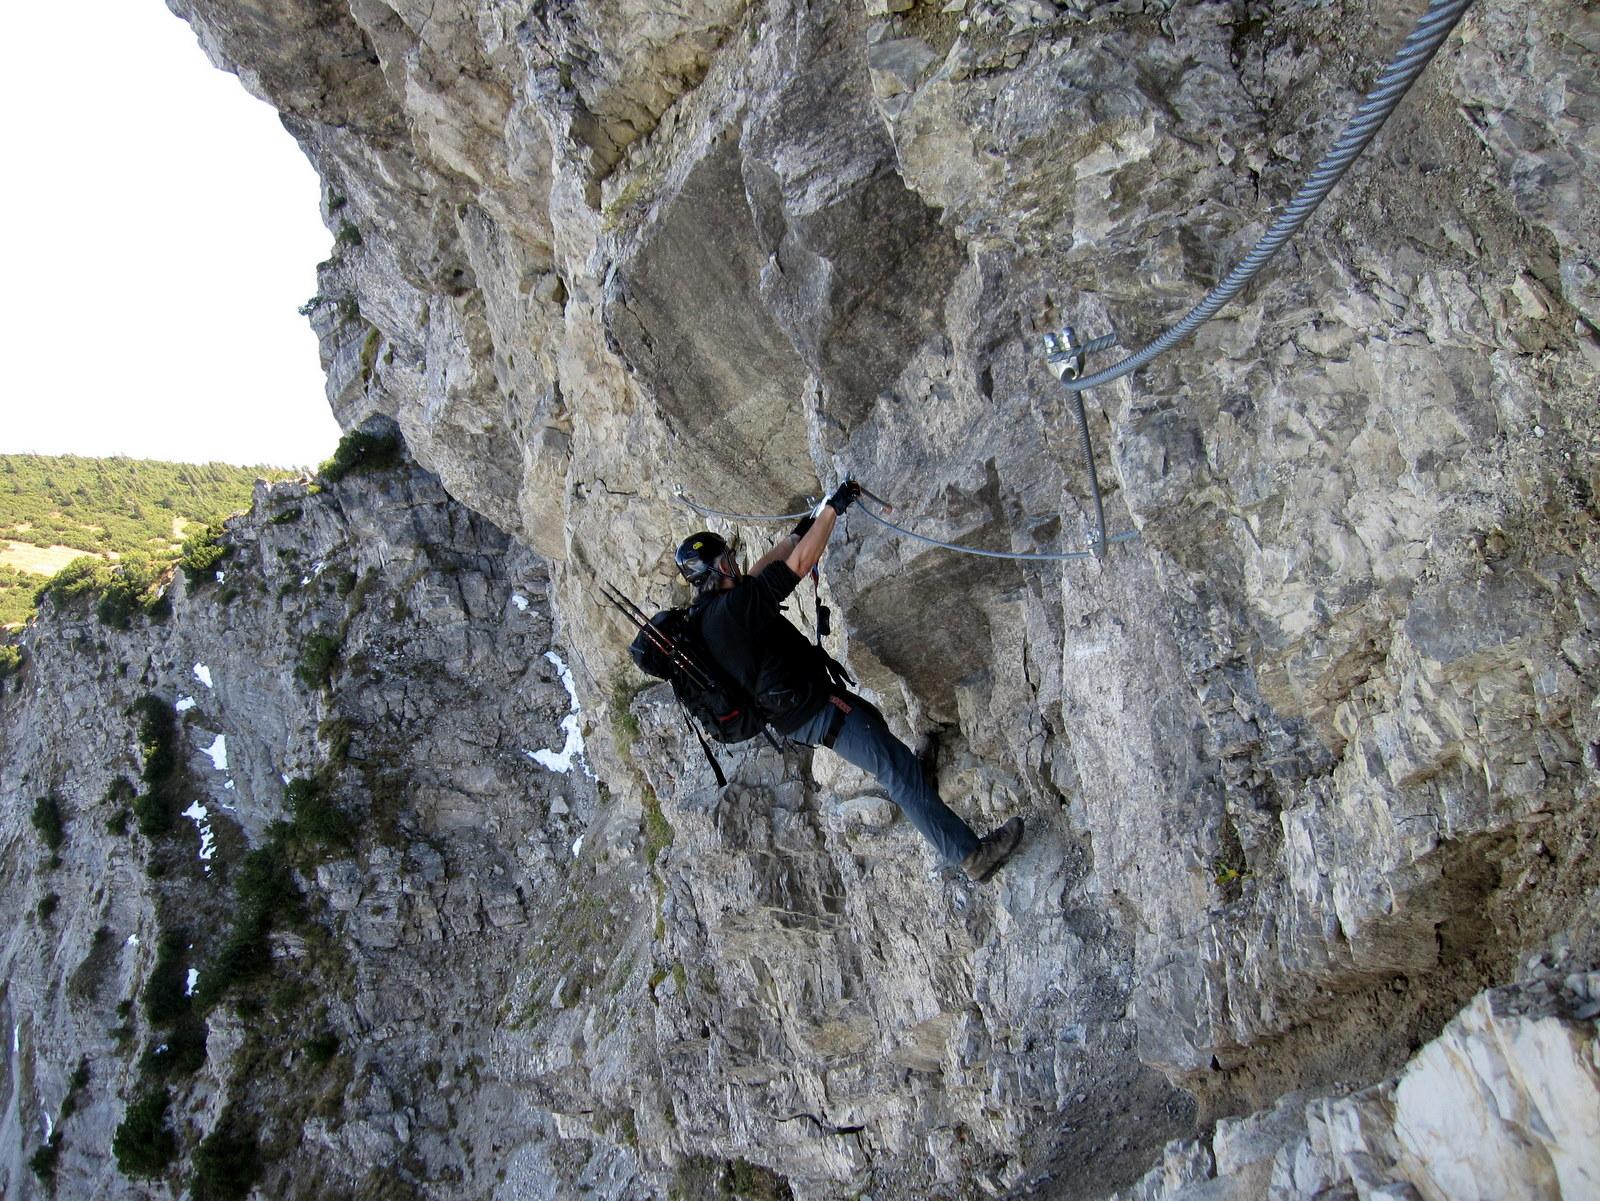 Klettersteig Iseler : Allgäu erleben salewa klettersteig am iseler